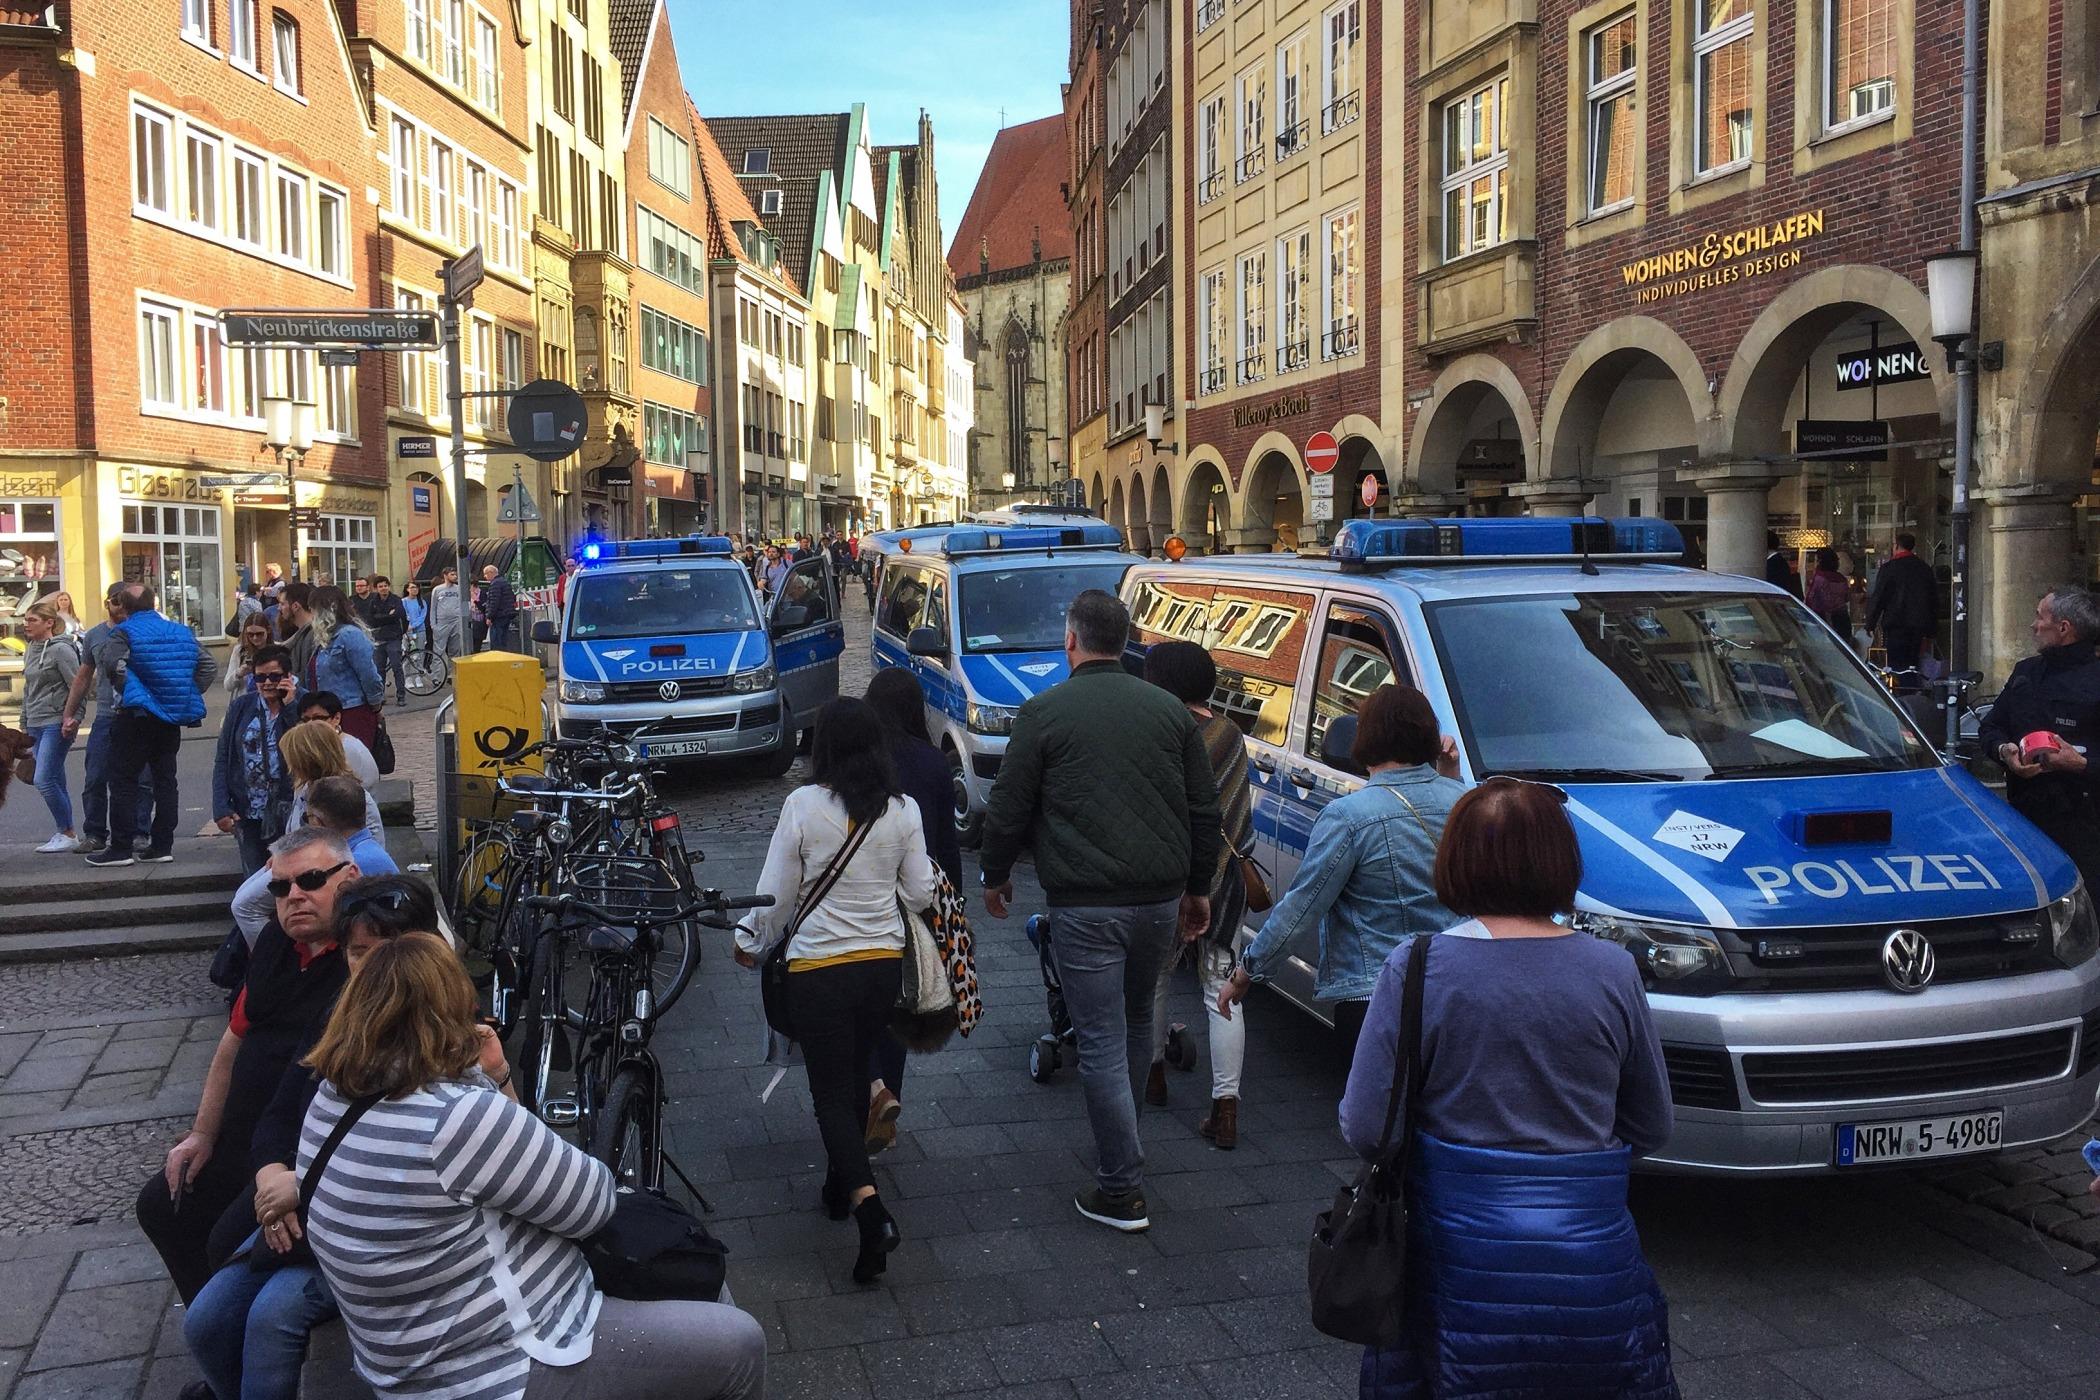 Policie v západoněmeckém Münsteru 7. dubna 2018